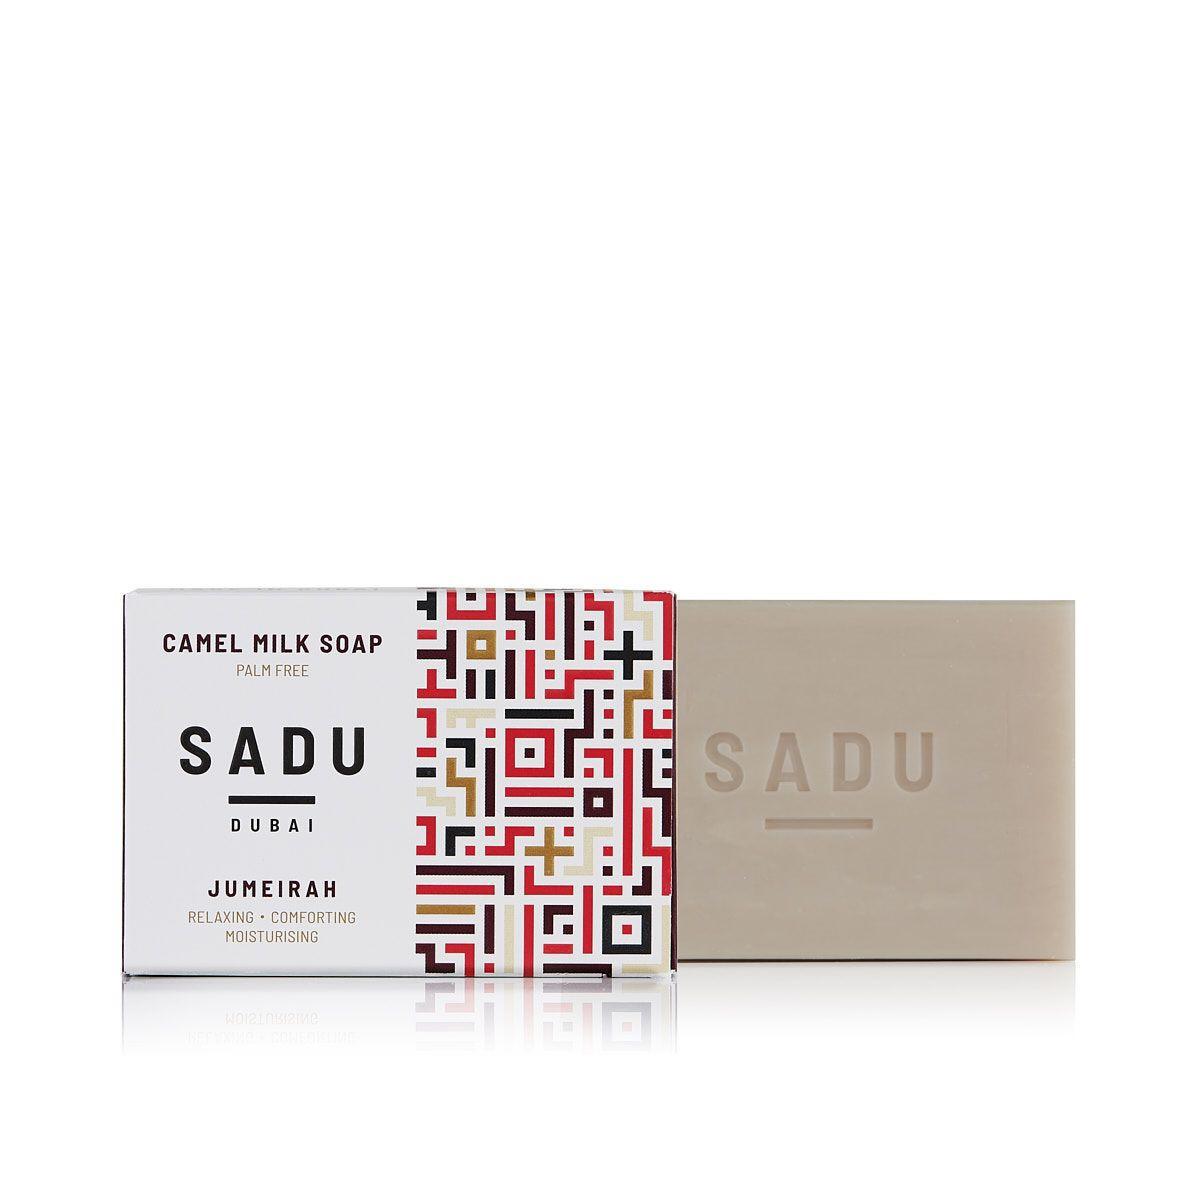 Camel milk soap Vanilla Wood - SADU collection